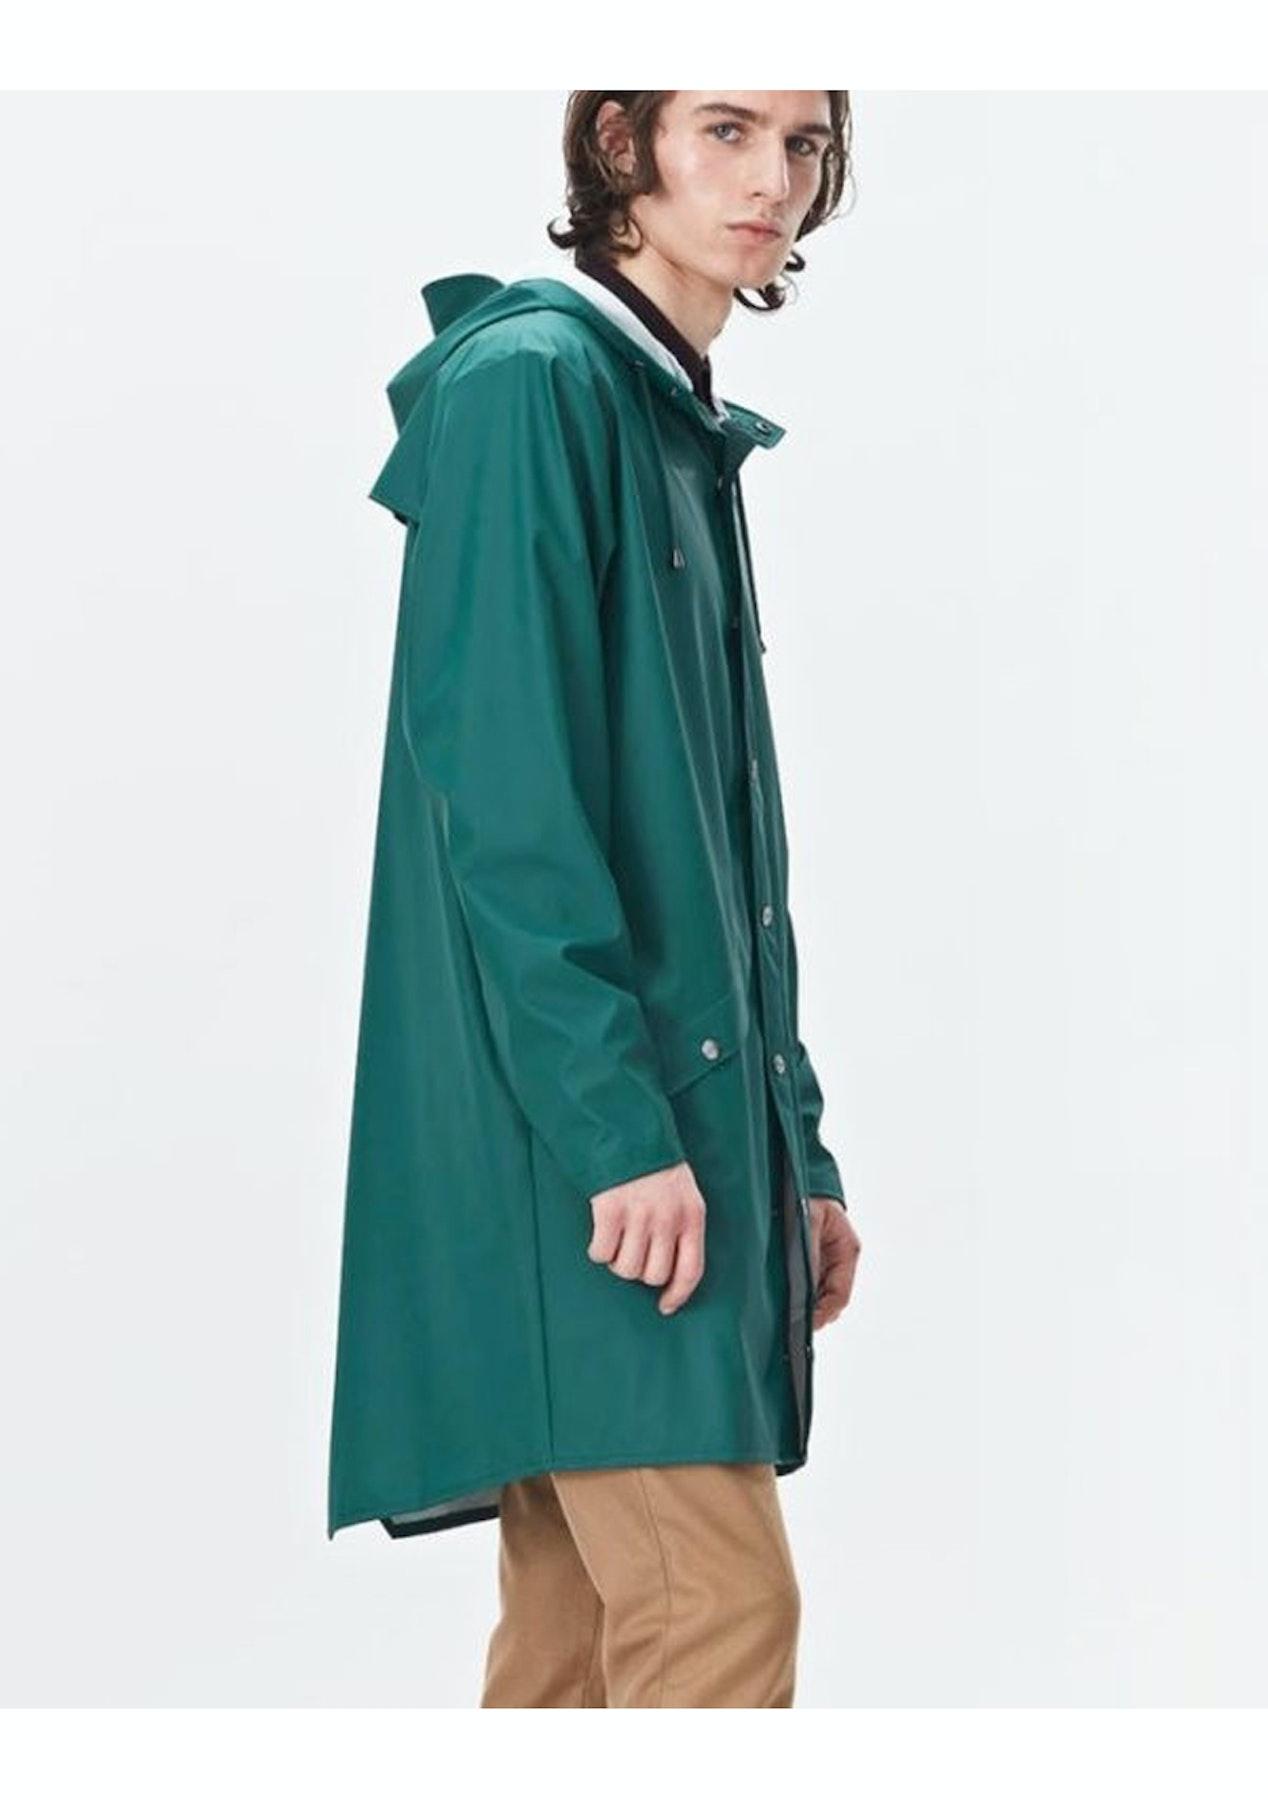 525a1bd3 Rains - Long Jacket (unisex) - Dark Teal - Rains Outlet - Onceit